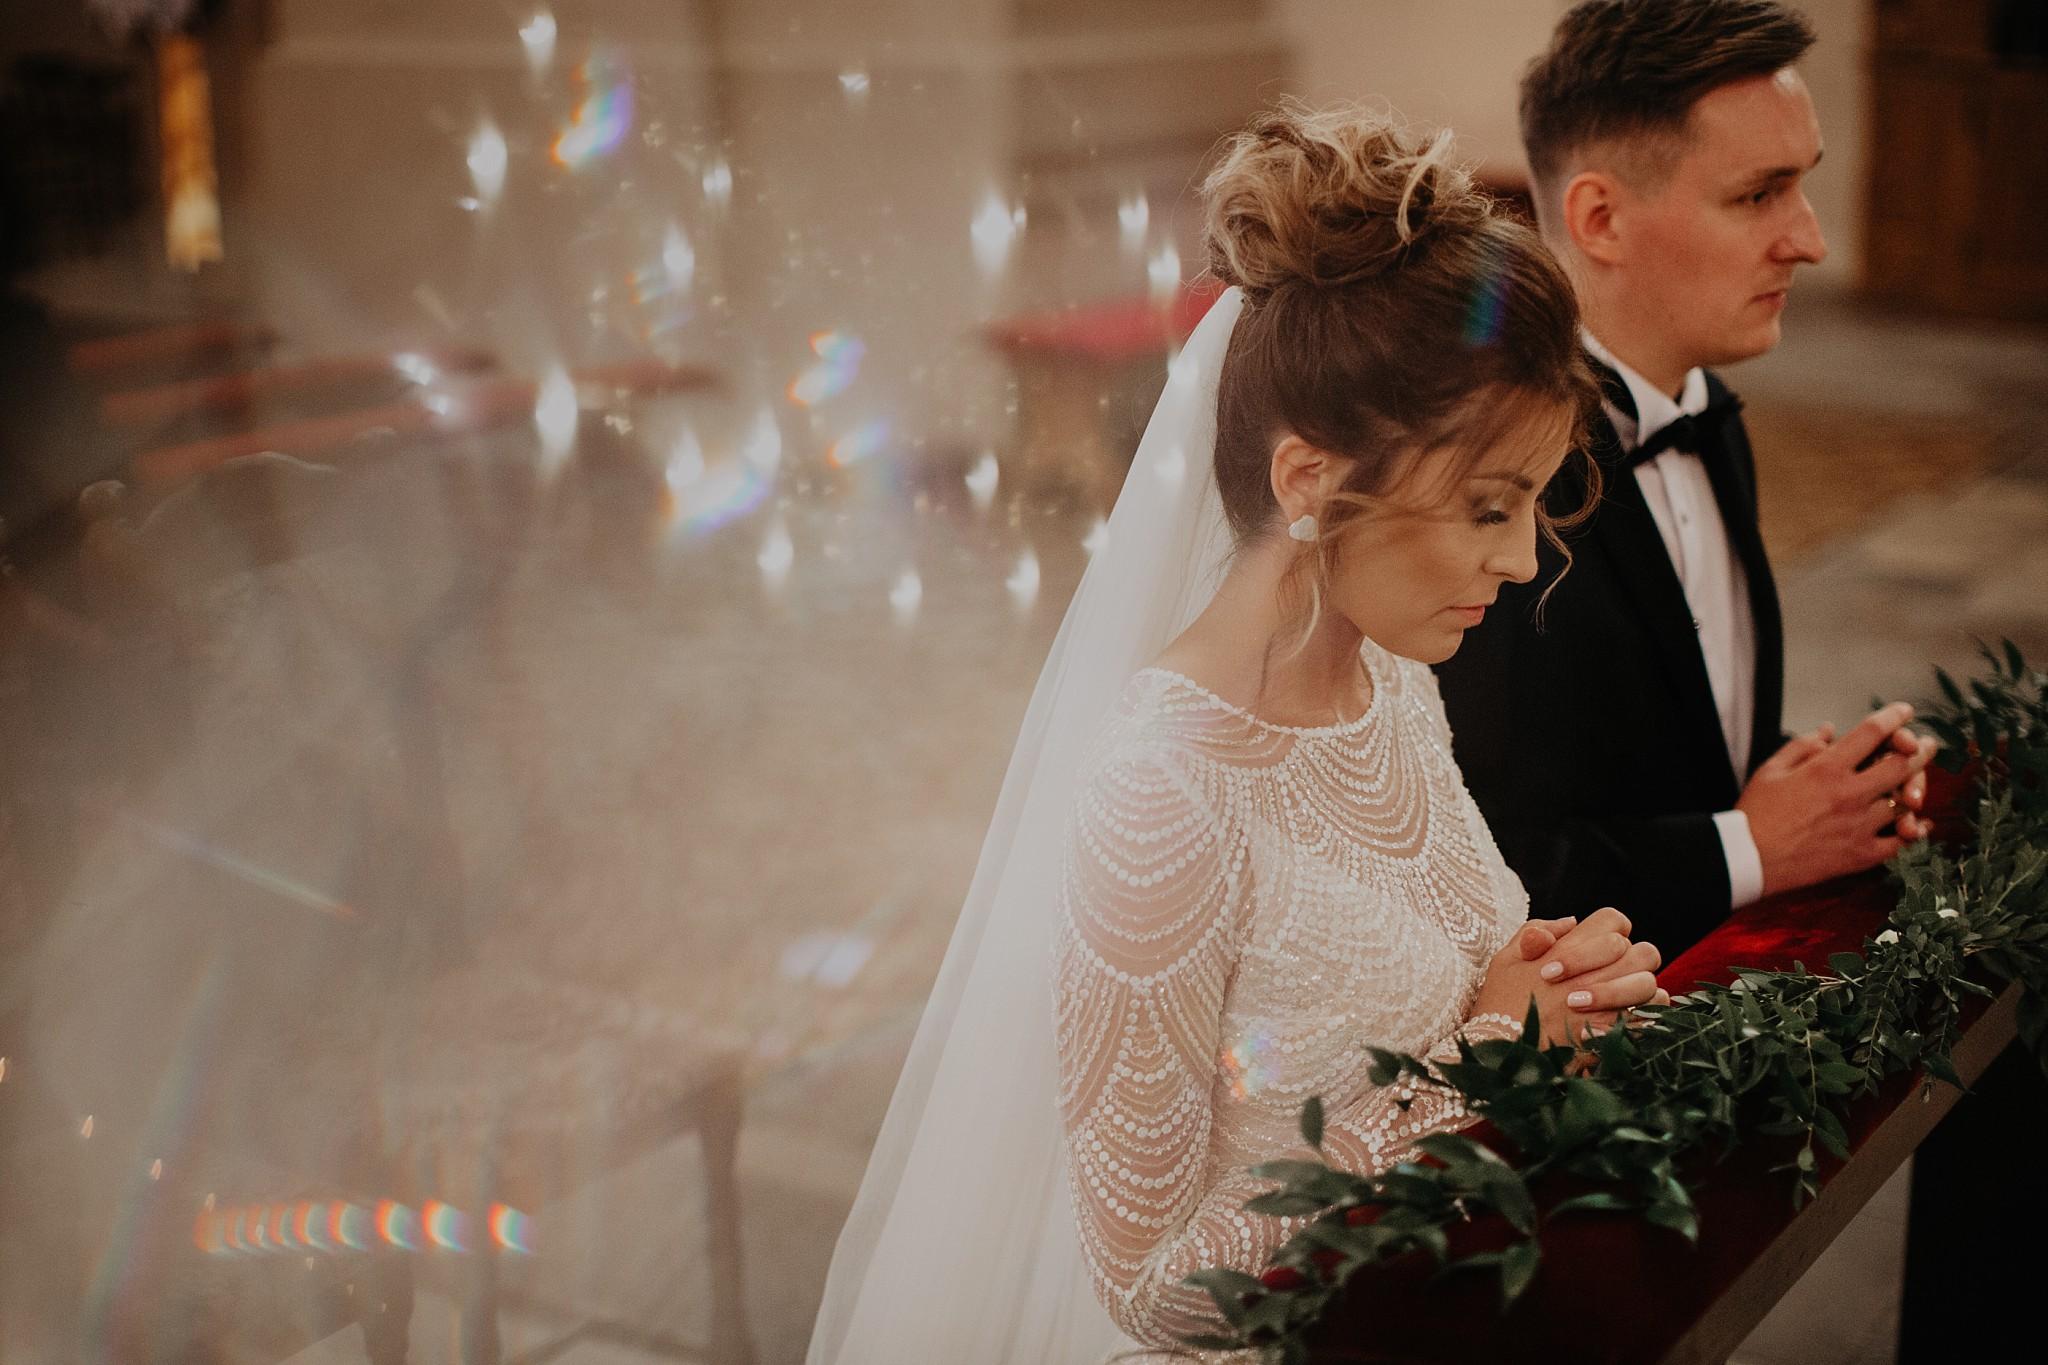 fotograf poznan wesele dobra truskawka piekne wesele pod poznaniem wesele w dobrej truskawce piekna para mloda slub marzen slub koronawirus slub listopad wesele koronawirus 196